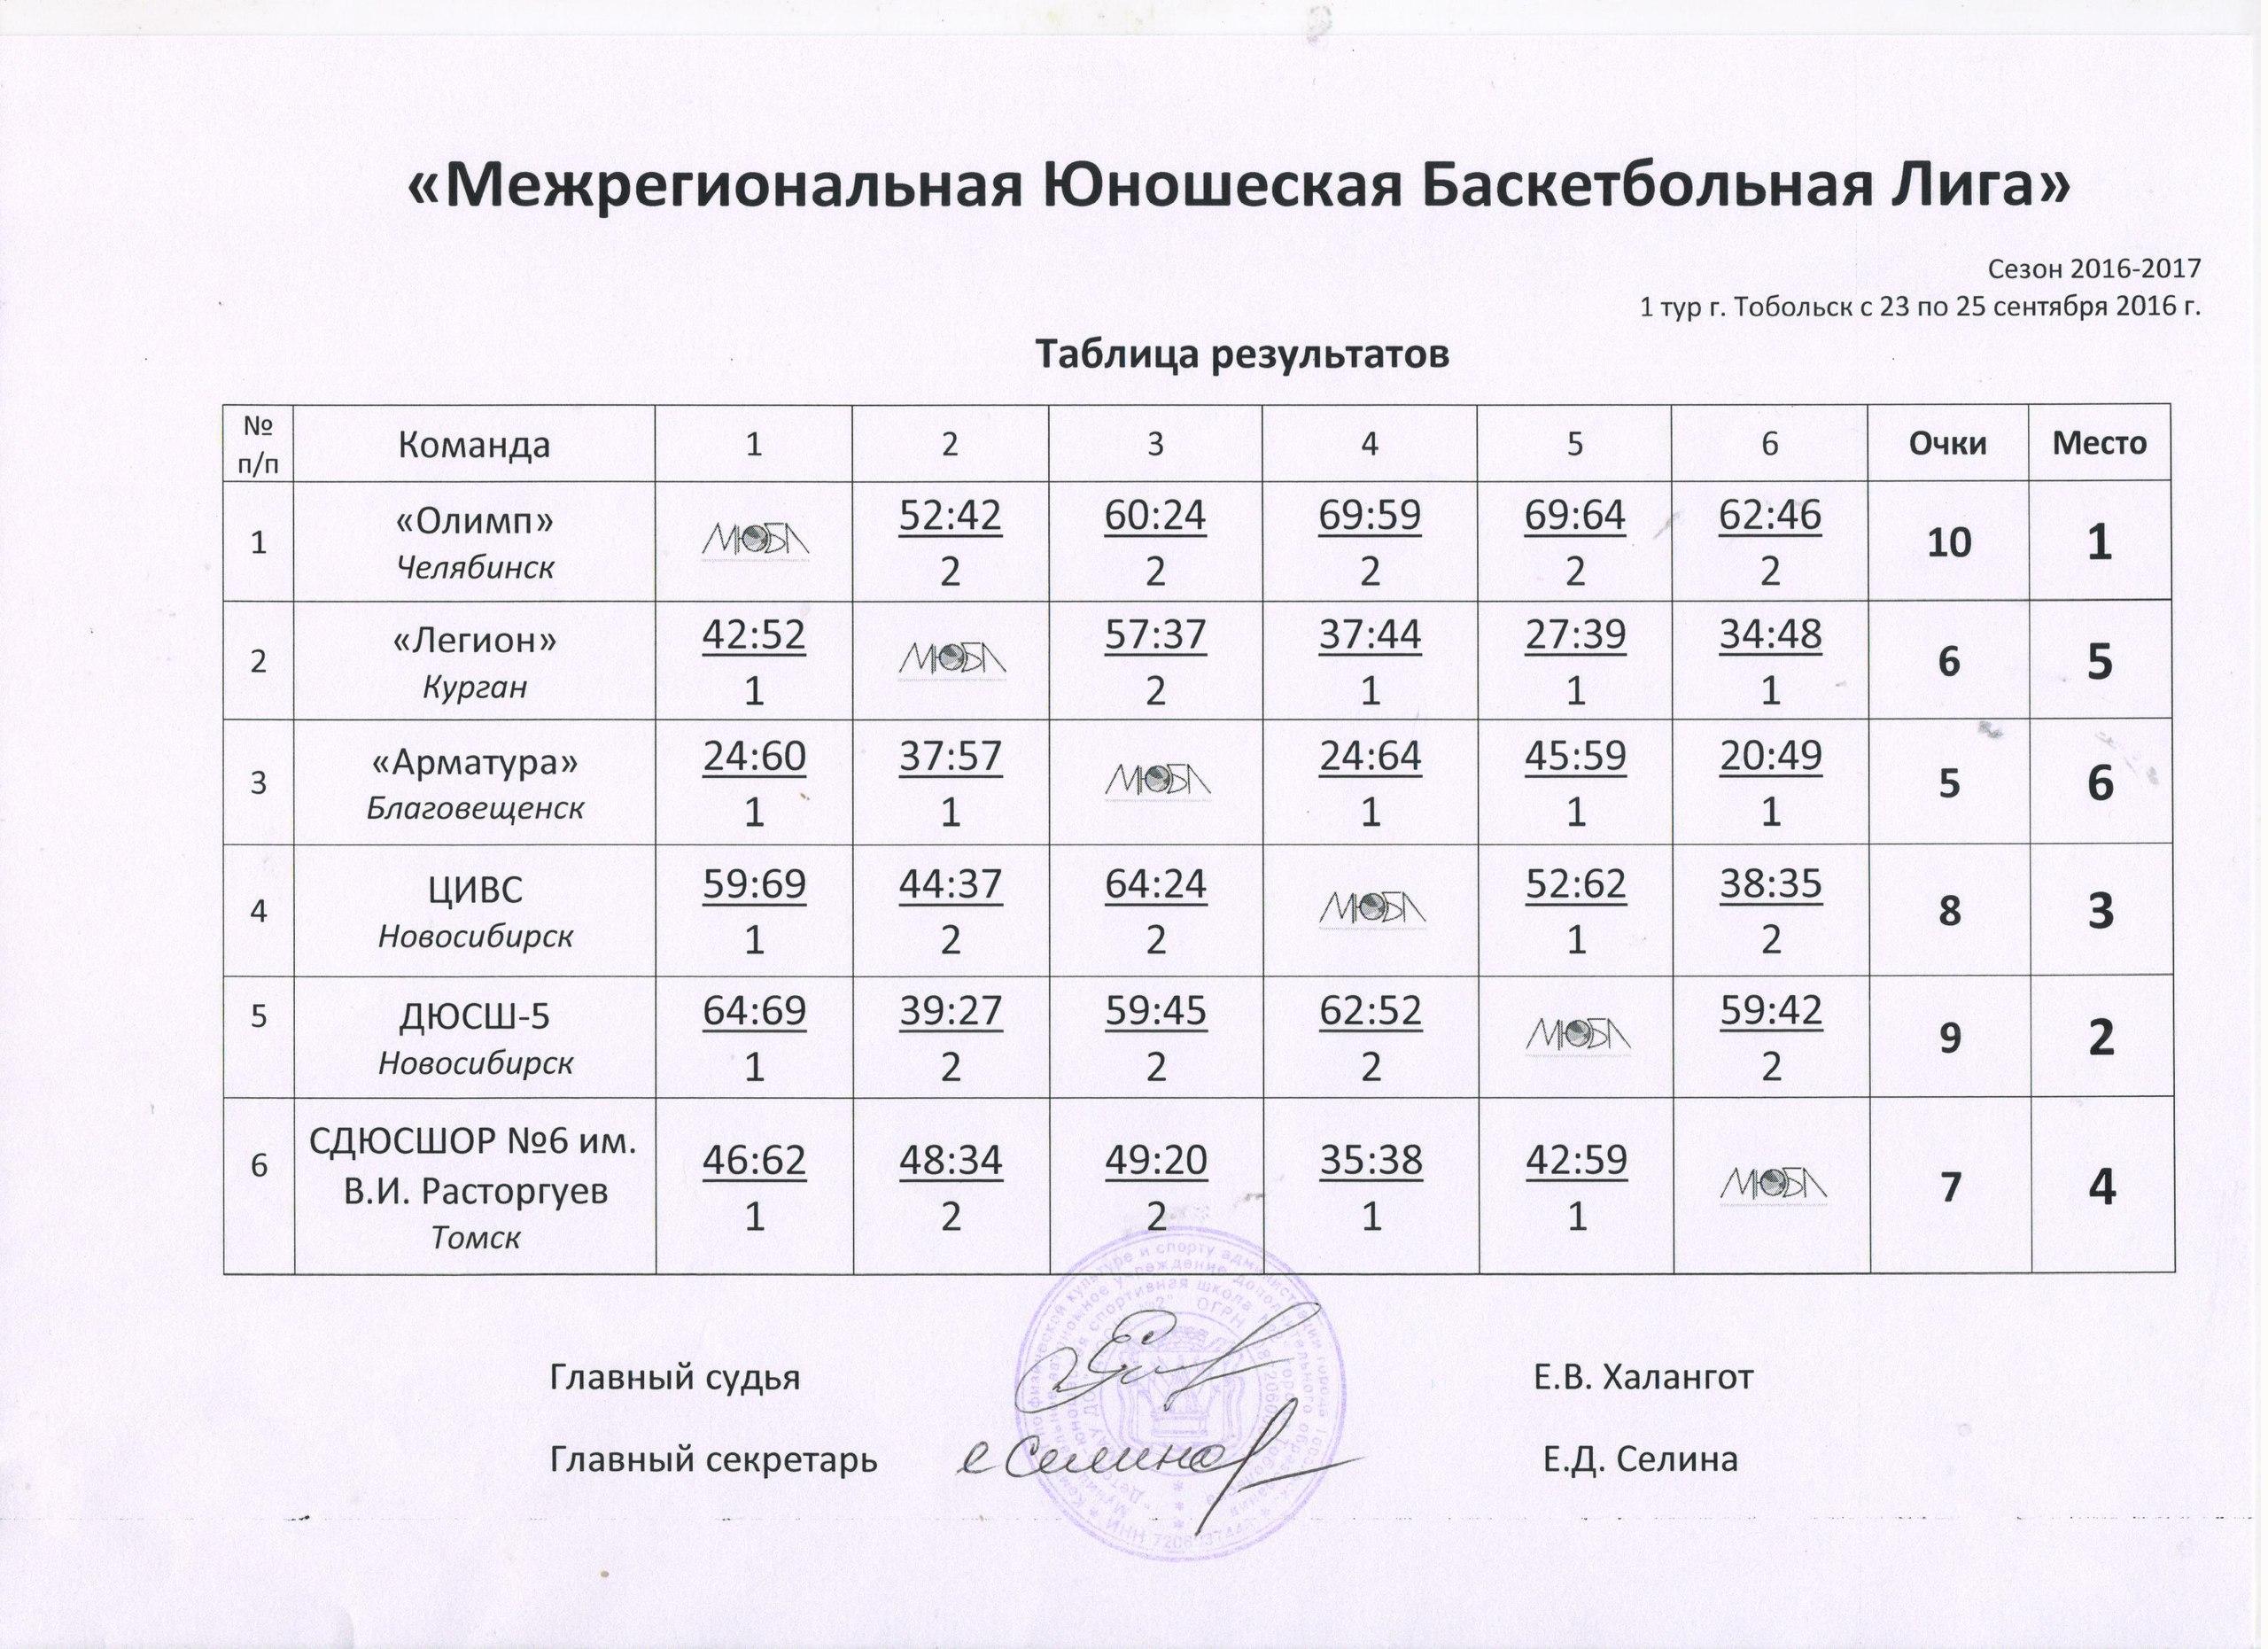 Таблица результатов первого тура МЮБЛ